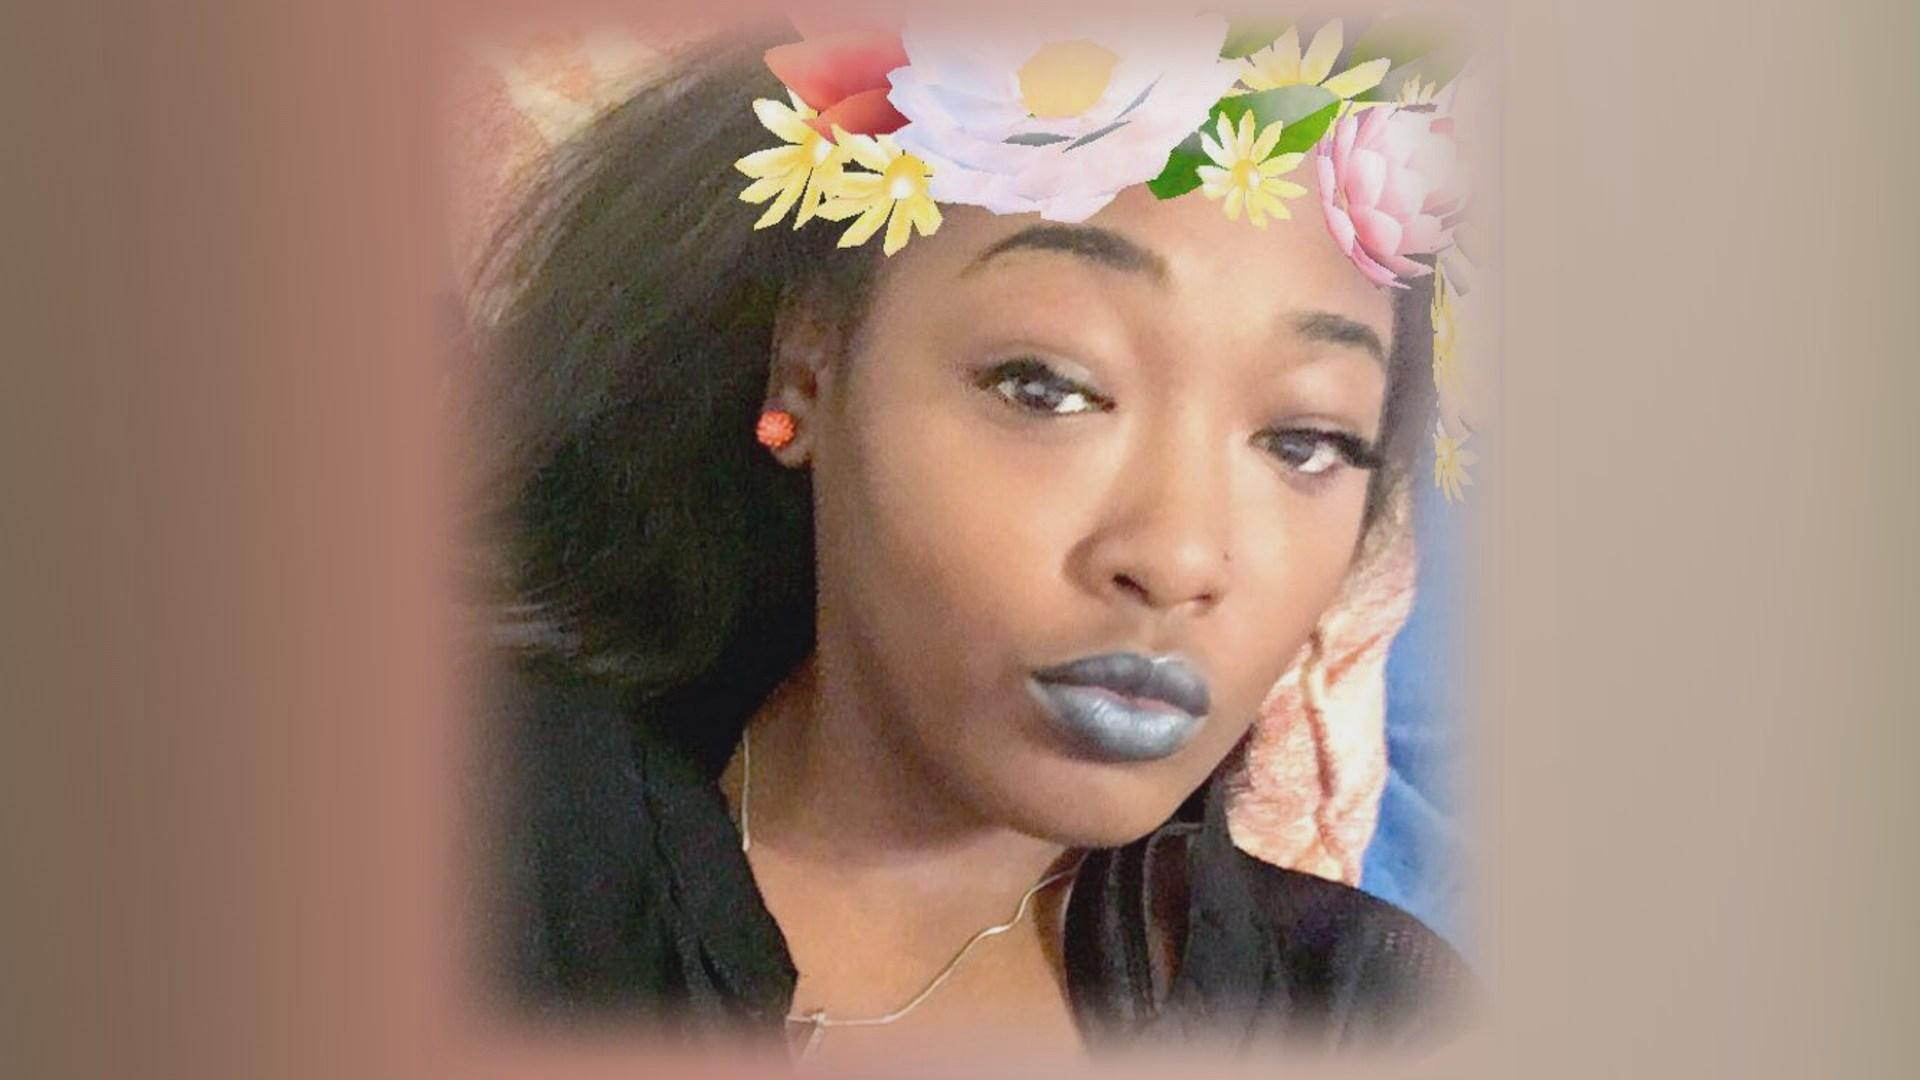 shooting victim, Tyrika Terrell age 22 (credit: family)